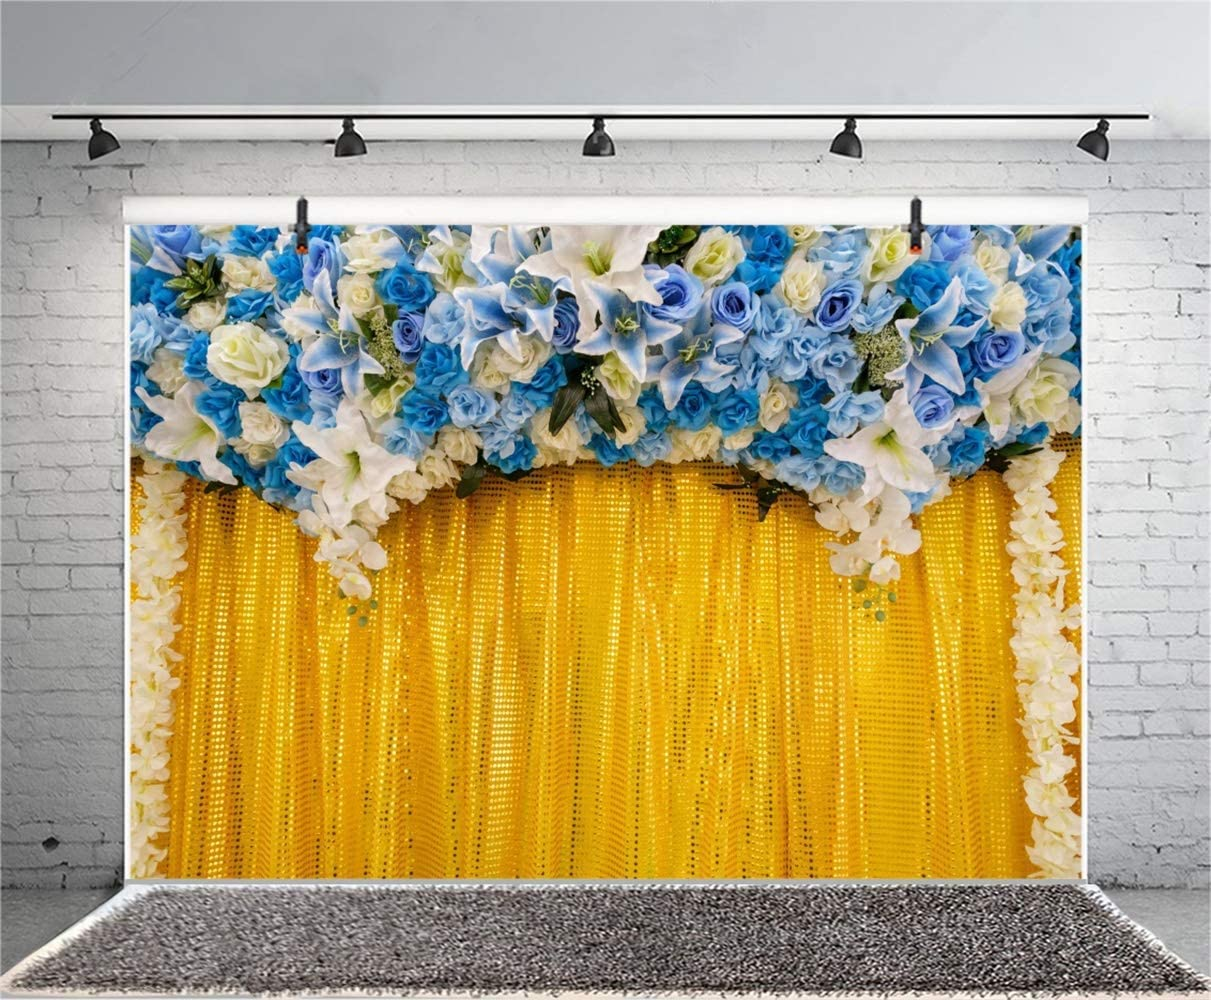 GoHeBe Graceful Blue Tulip Rose Flowers Wedding Stage Backdrop 10x7ft Vinyl Floral Wedding Ceremony Photobooth Yellow Sequin Curtain Background Wedding Video Shoot Bridal Shower Bride Portrait